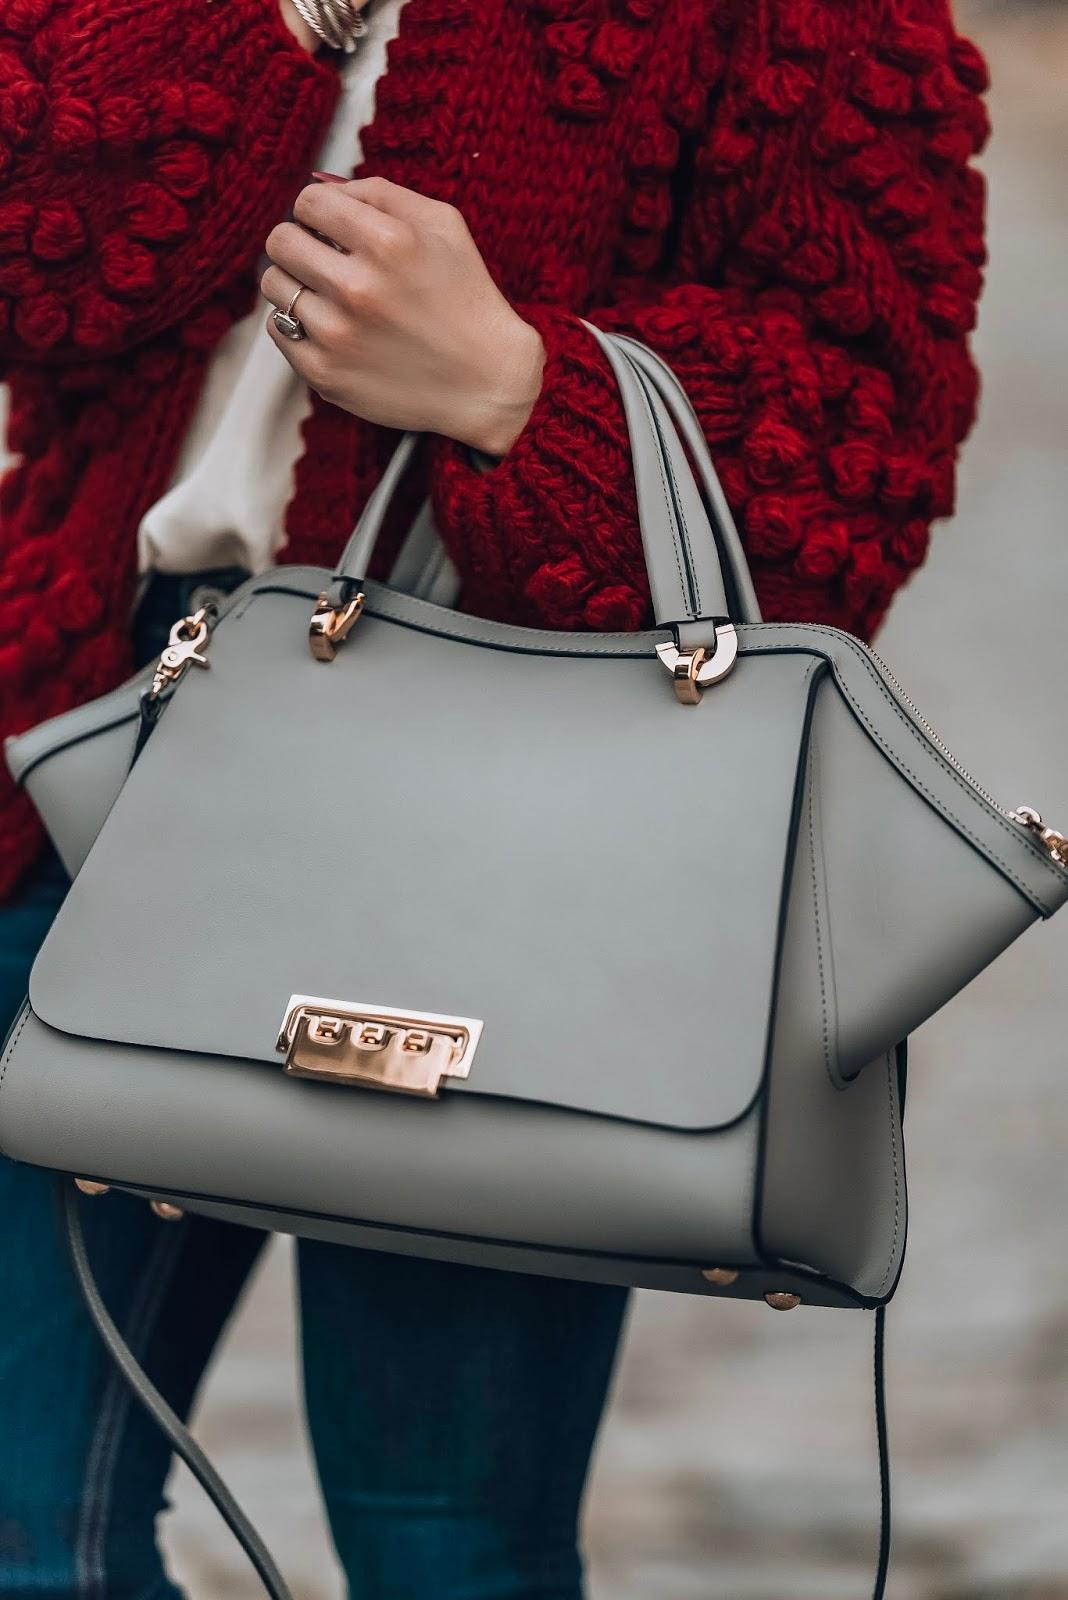 ZAC Zac Posen Bag - Something Delightful Blog